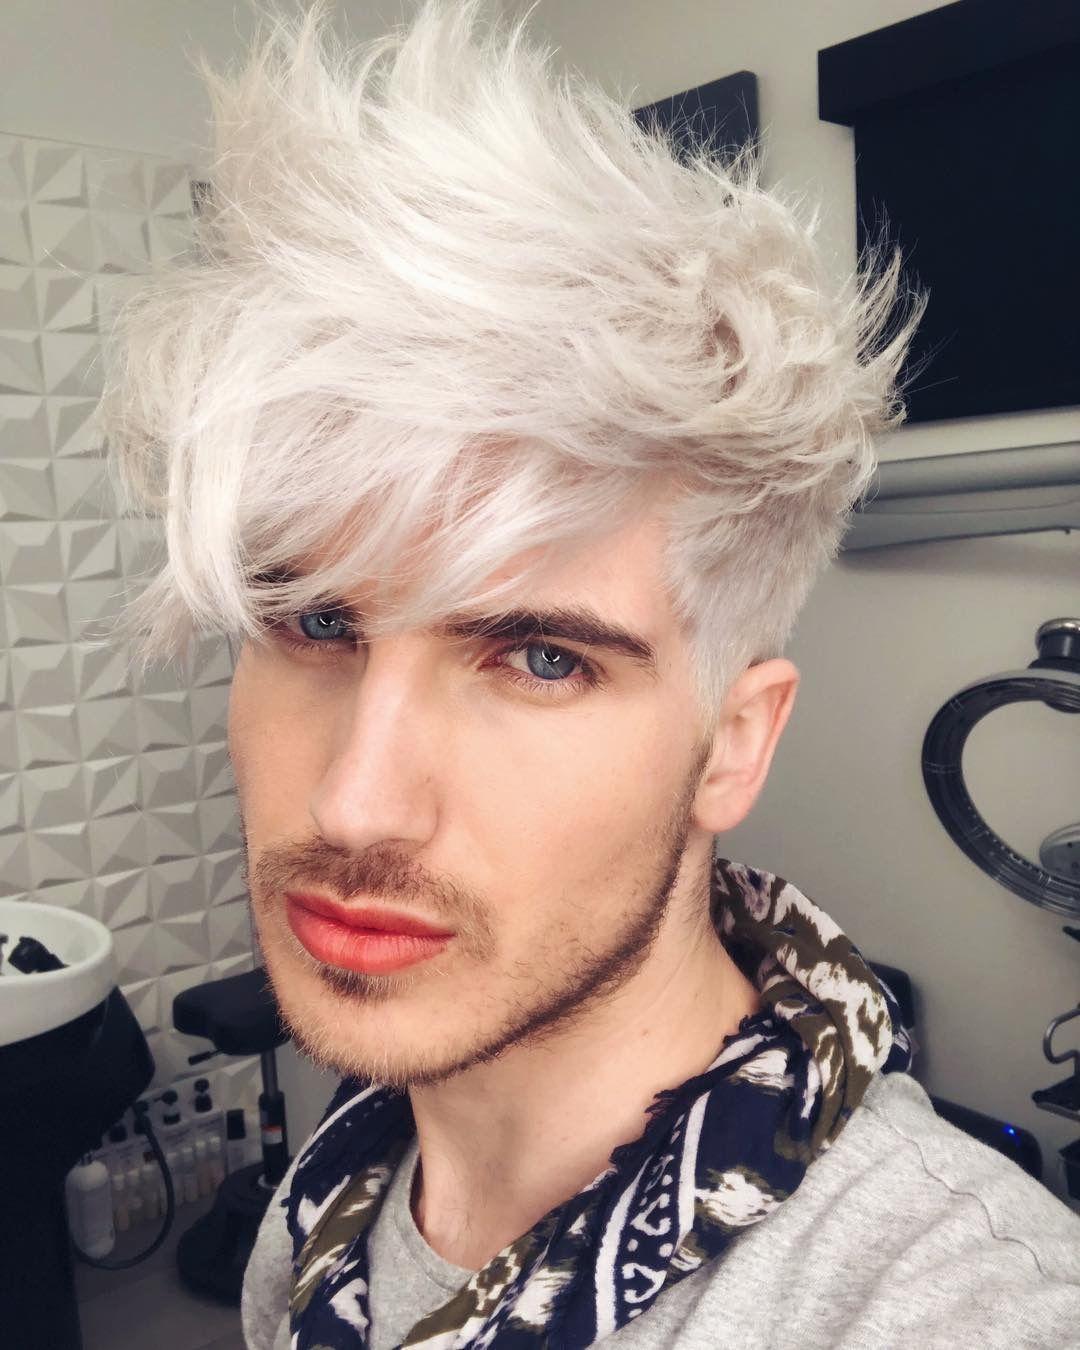 Jack Frost Vibes Joeygraceffa Jack Frost Vibes Joeygraceffa Cuando Llega La Primavera Siemp White Hair Men Men Blonde Hair Men Hair Color